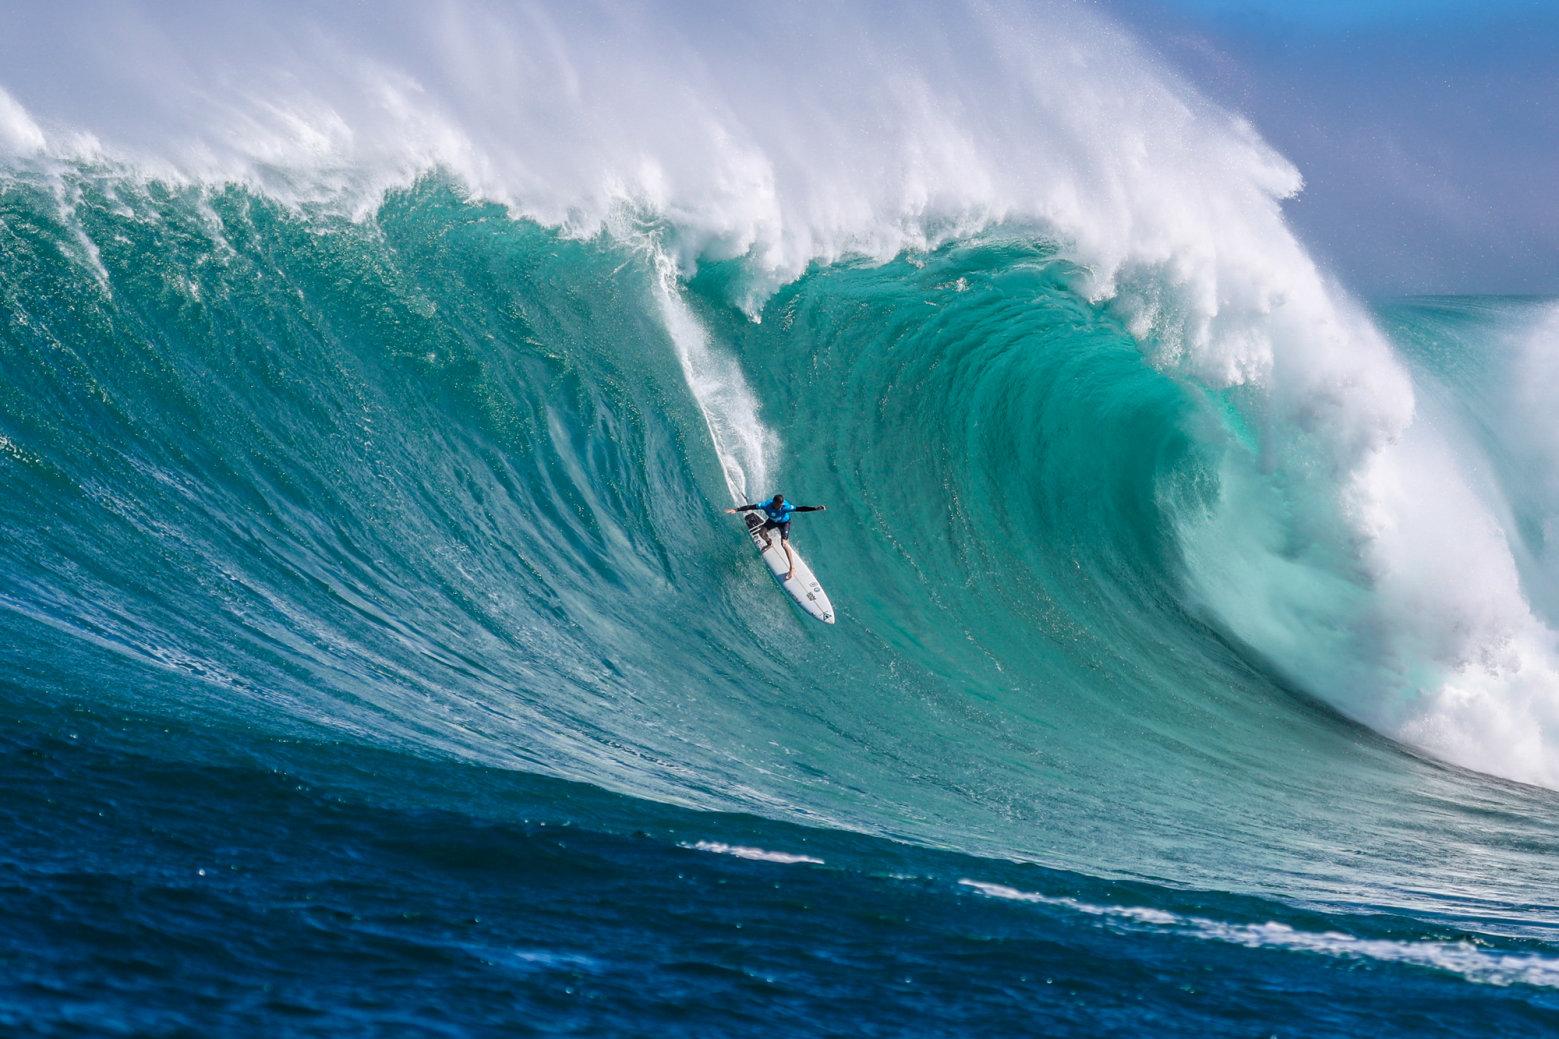 3e8f15201c The Eddie Aikau Big Wave Invitational Will Return This Winter - Surfline